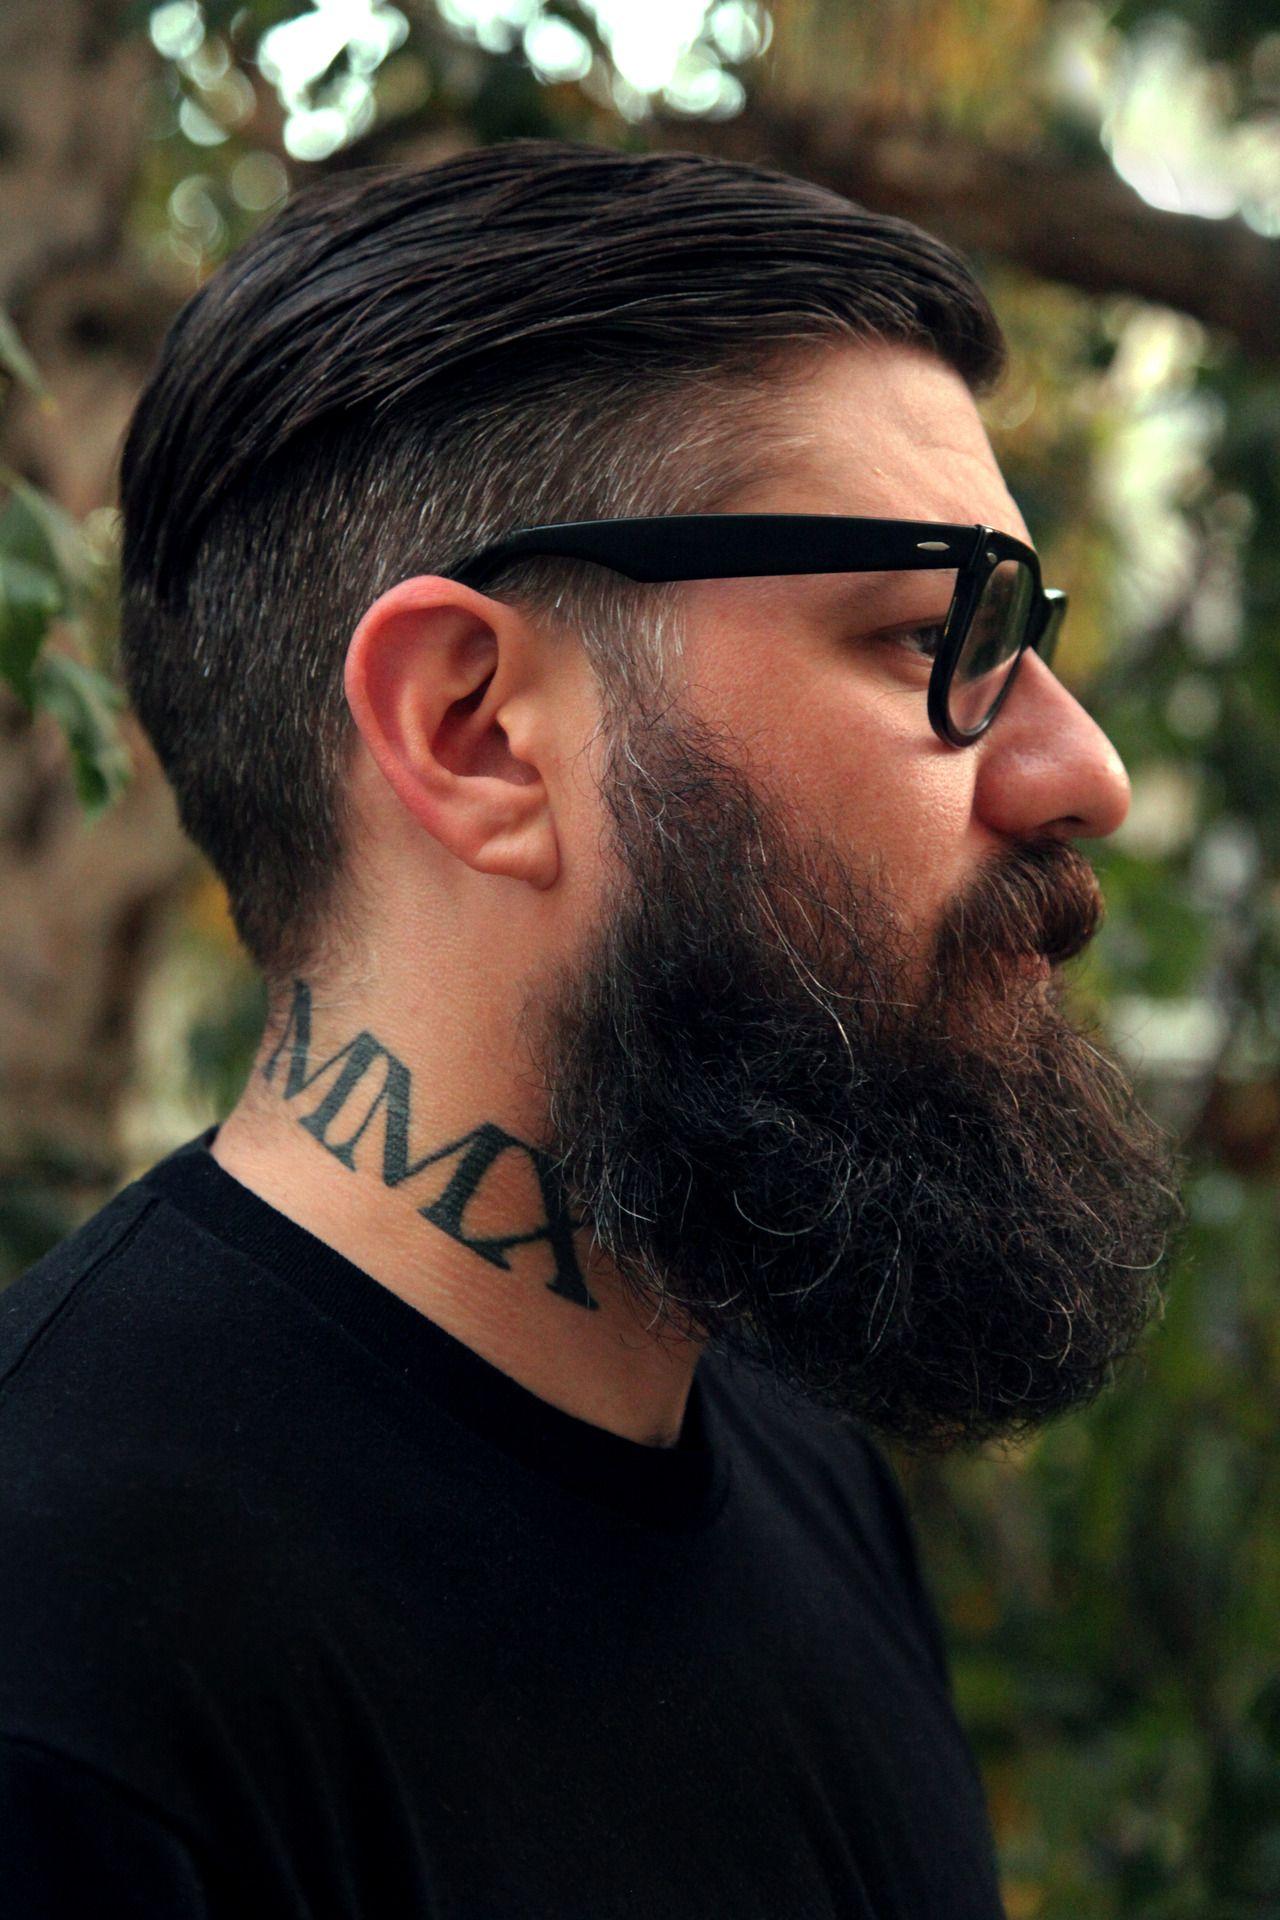 0c5323f9d9ac profile shot of big thick dark full beard beards bearded man men nice  coloration glasses style undercut tattoos tattooed tattoos